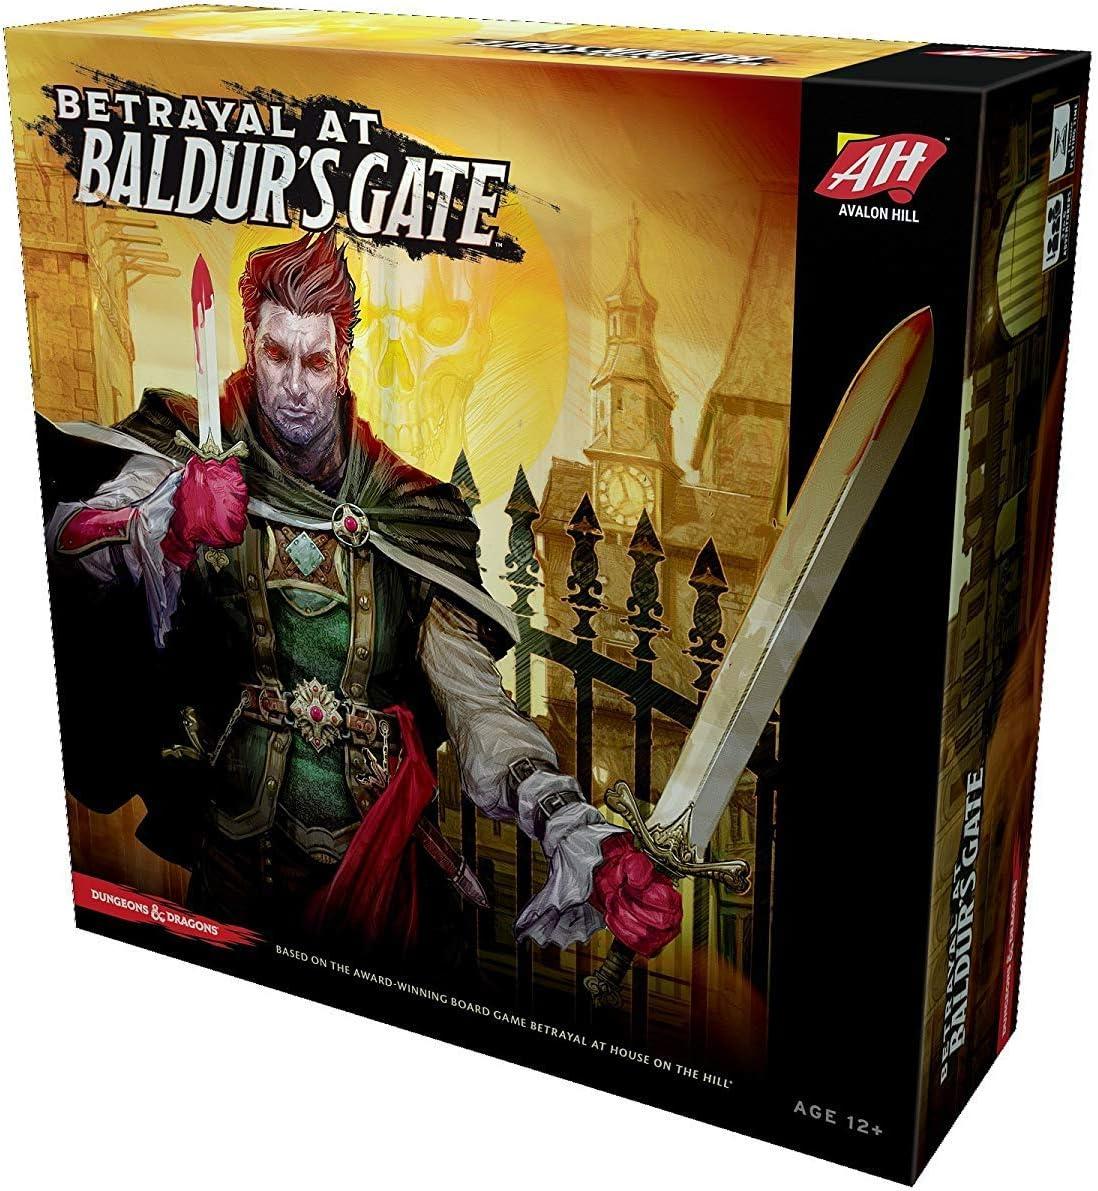 Avalon Hill Board Game Betrayal at Baldurs Gate english Wizards ...